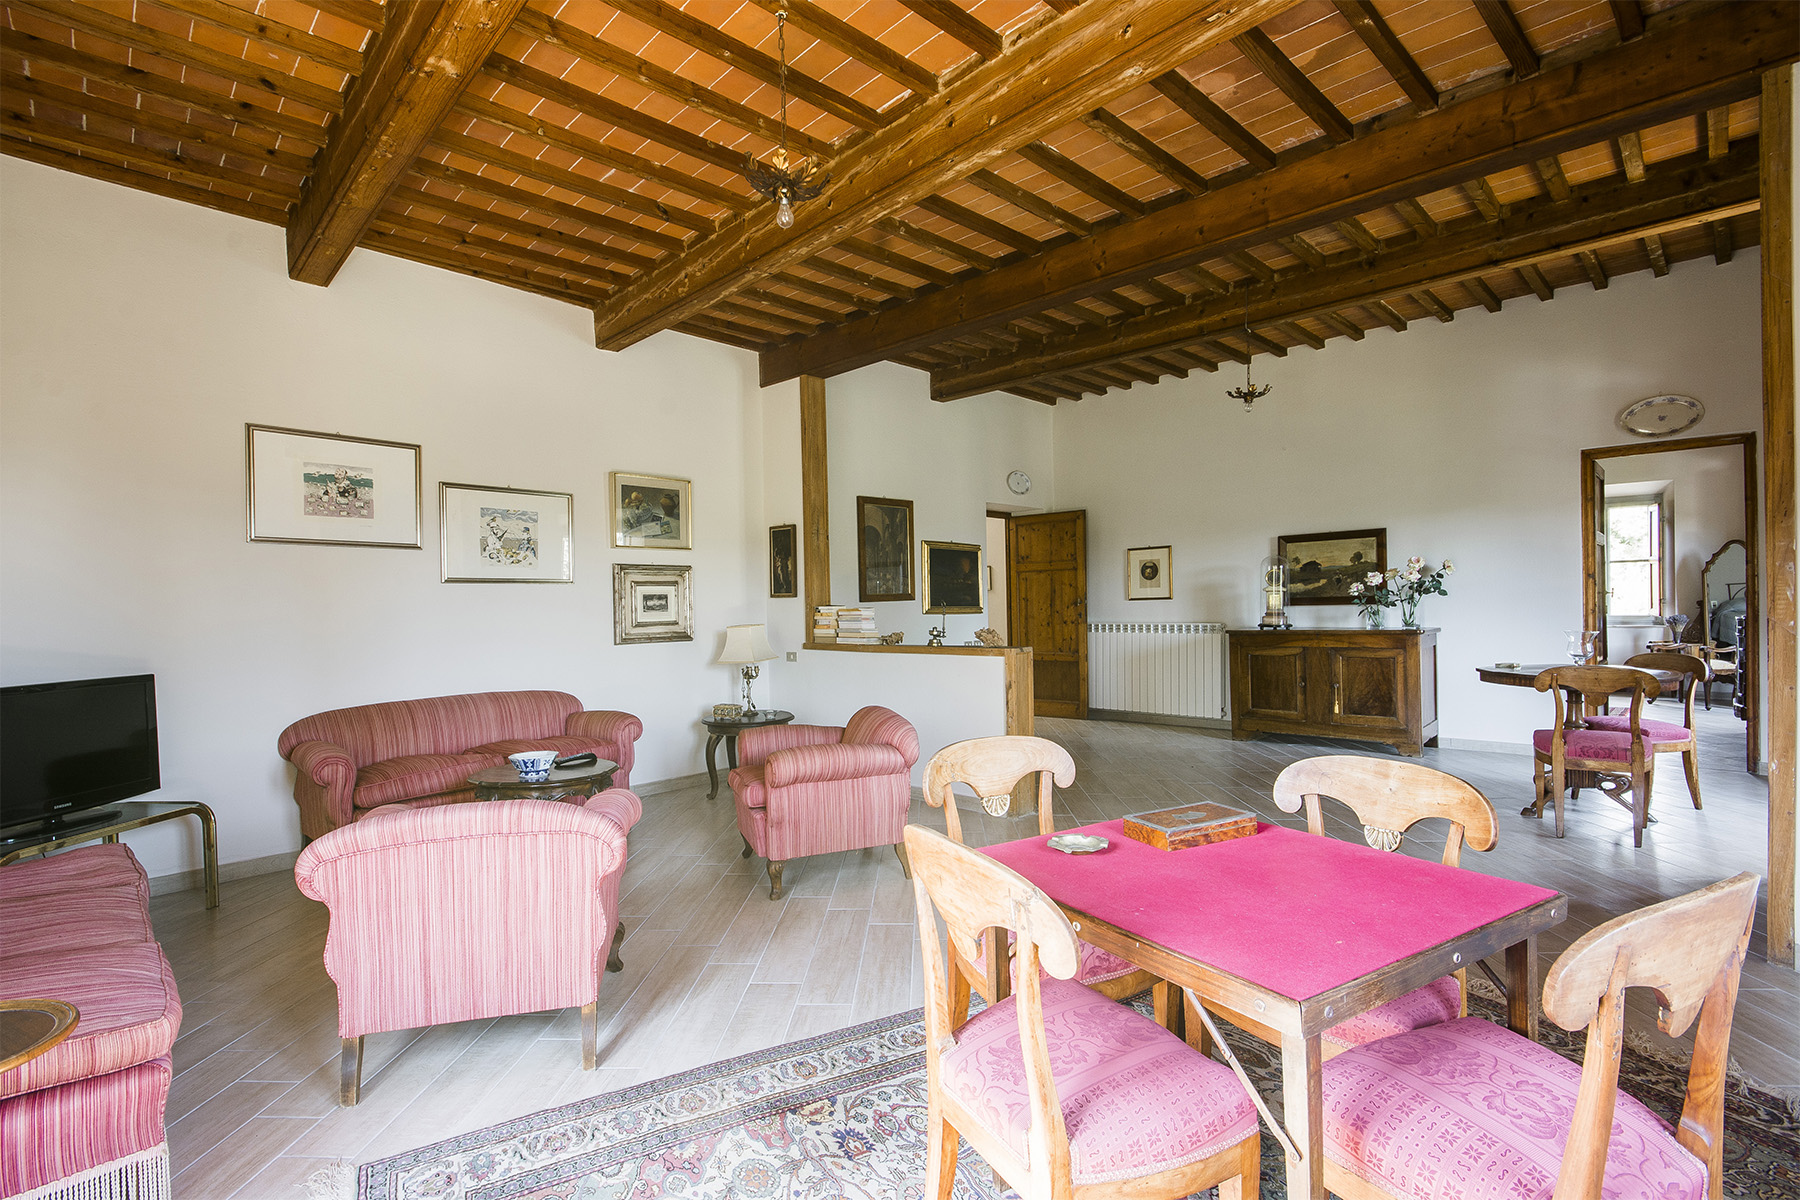 Villa in Vendita a Lucca: 5 locali, 1150 mq - Foto 25